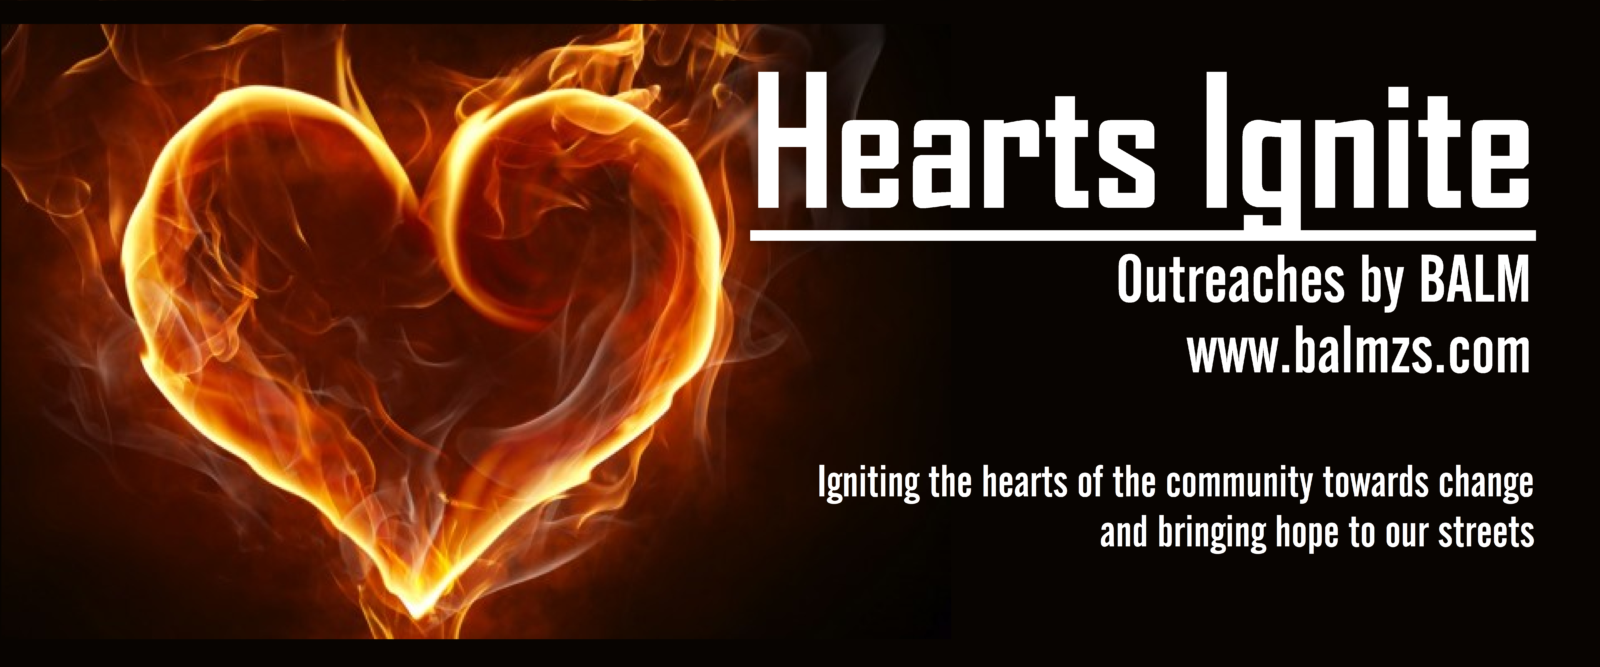 Hearts Ignite banner